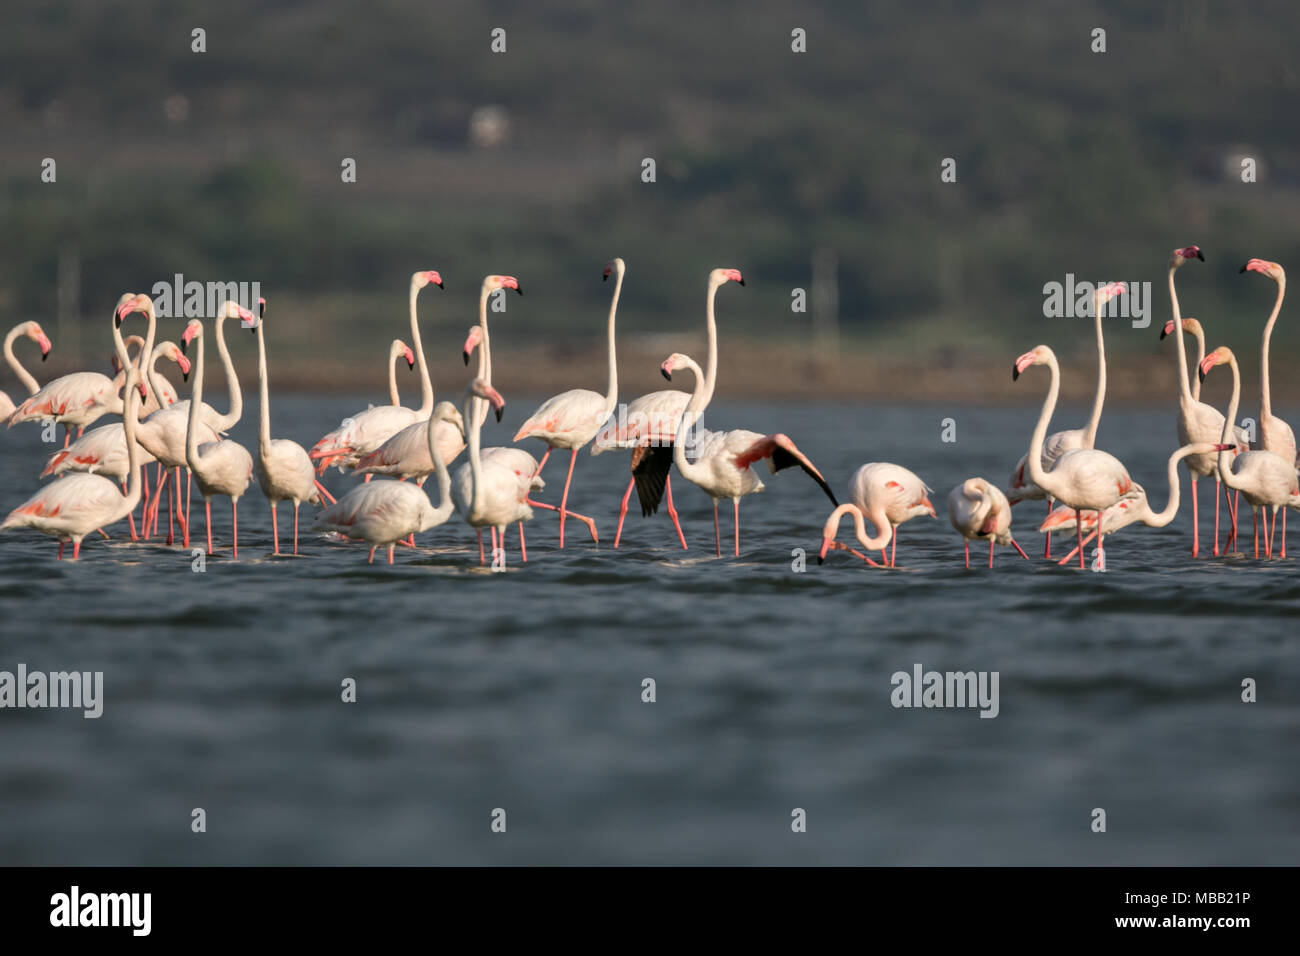 Der greater Flamingo (Phoenicopterus Roseus) um Pune an Bhigwan Vogelschutzgebiet, Maharashtra, Indien gefunden. Stockbild